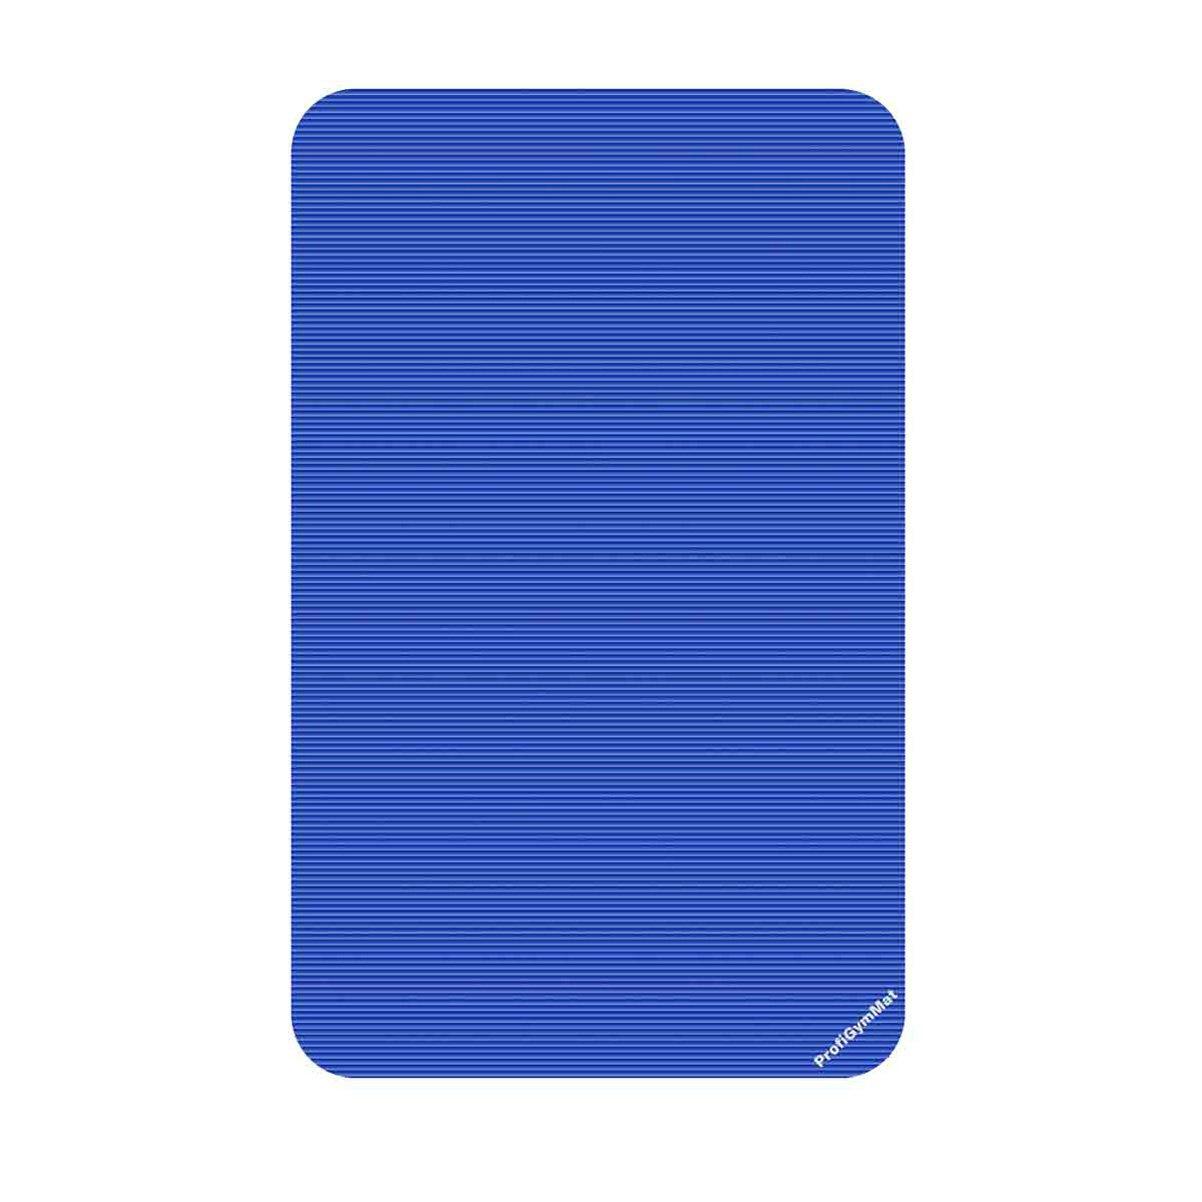 Gymnastikmatte / Yogamatte - TheraMat, blau 1.5 cm, blau TheraMat, 9862c3